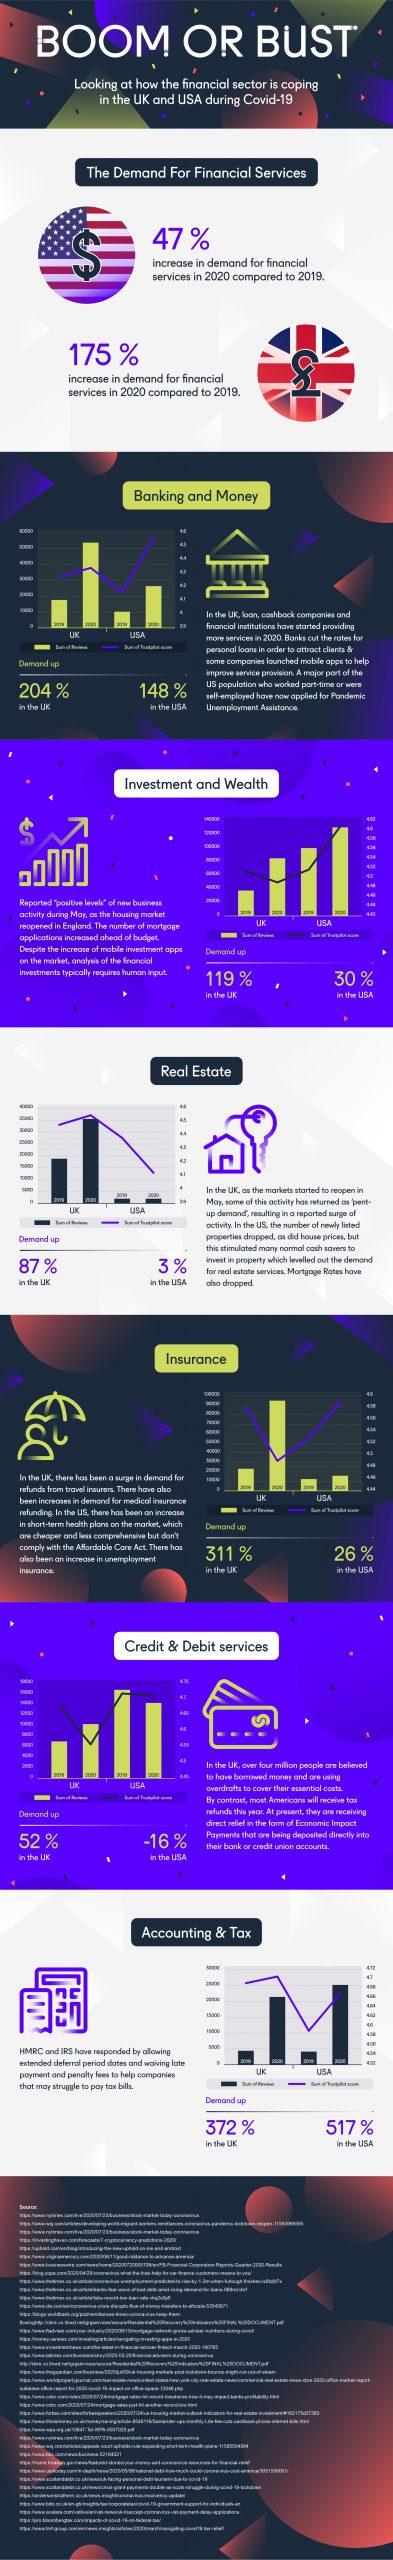 Awaken infographic